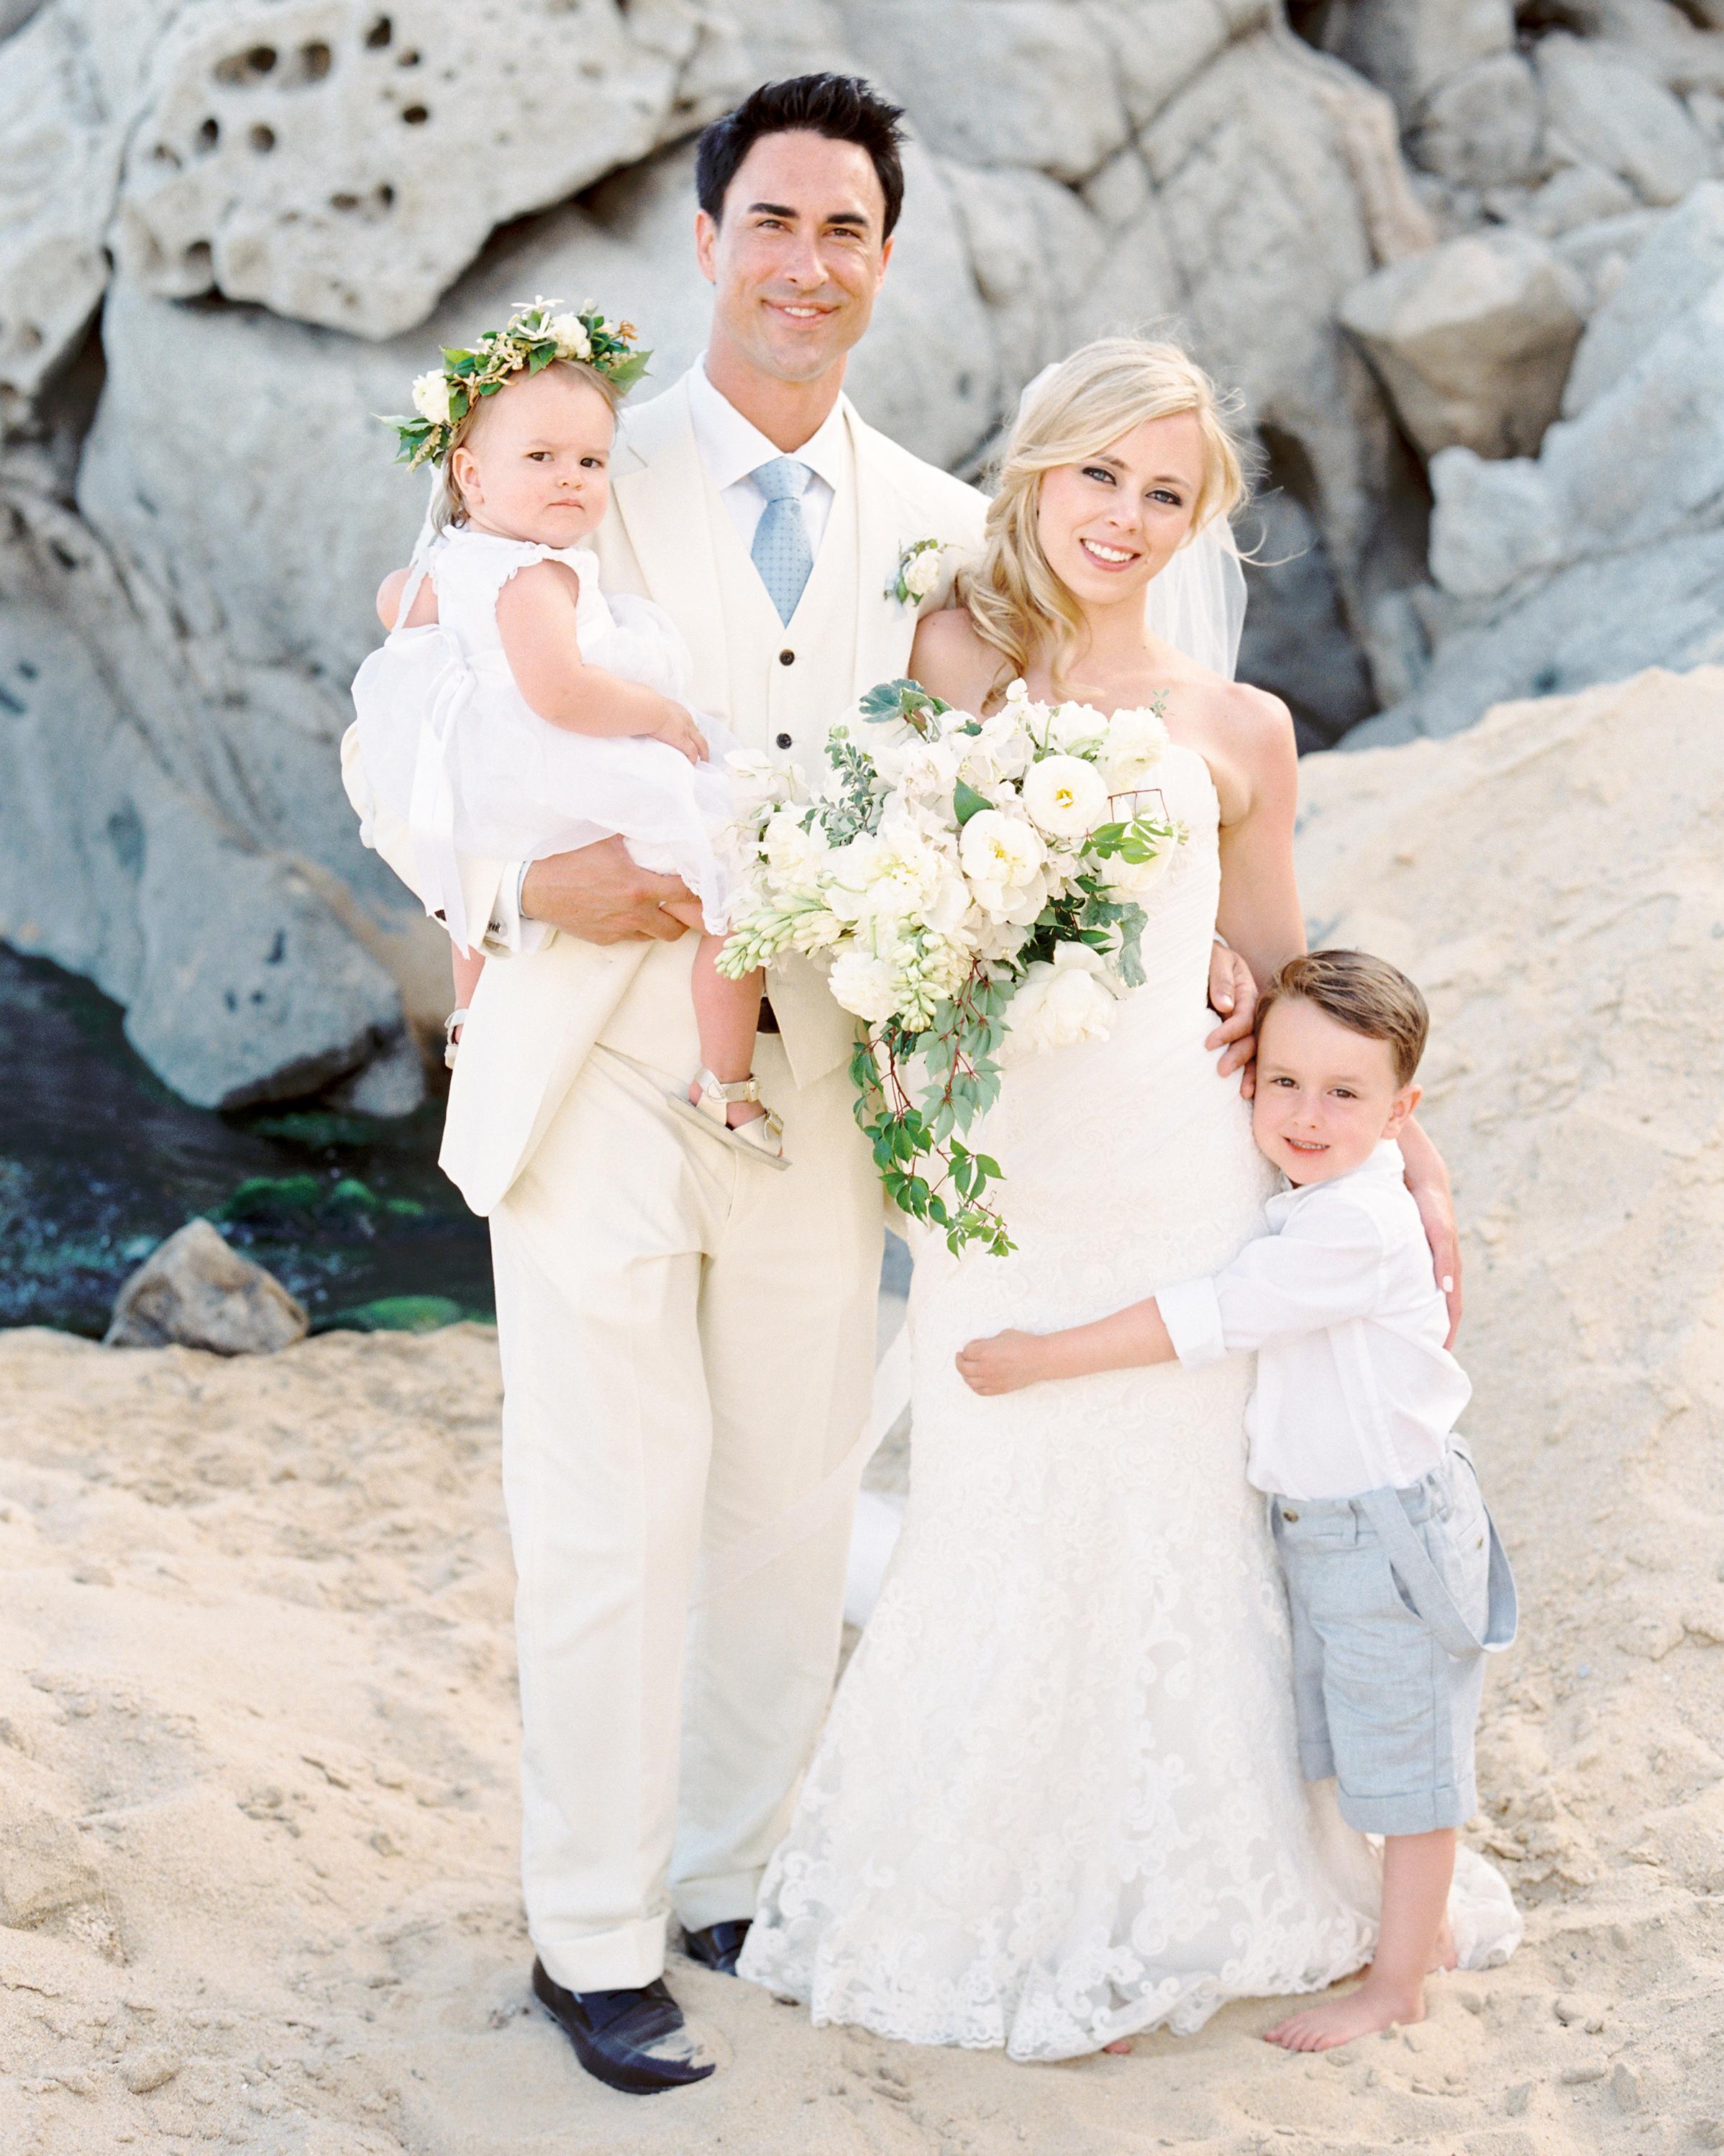 megan-jeremy-wedding-family-25-s112680-0216.jpg